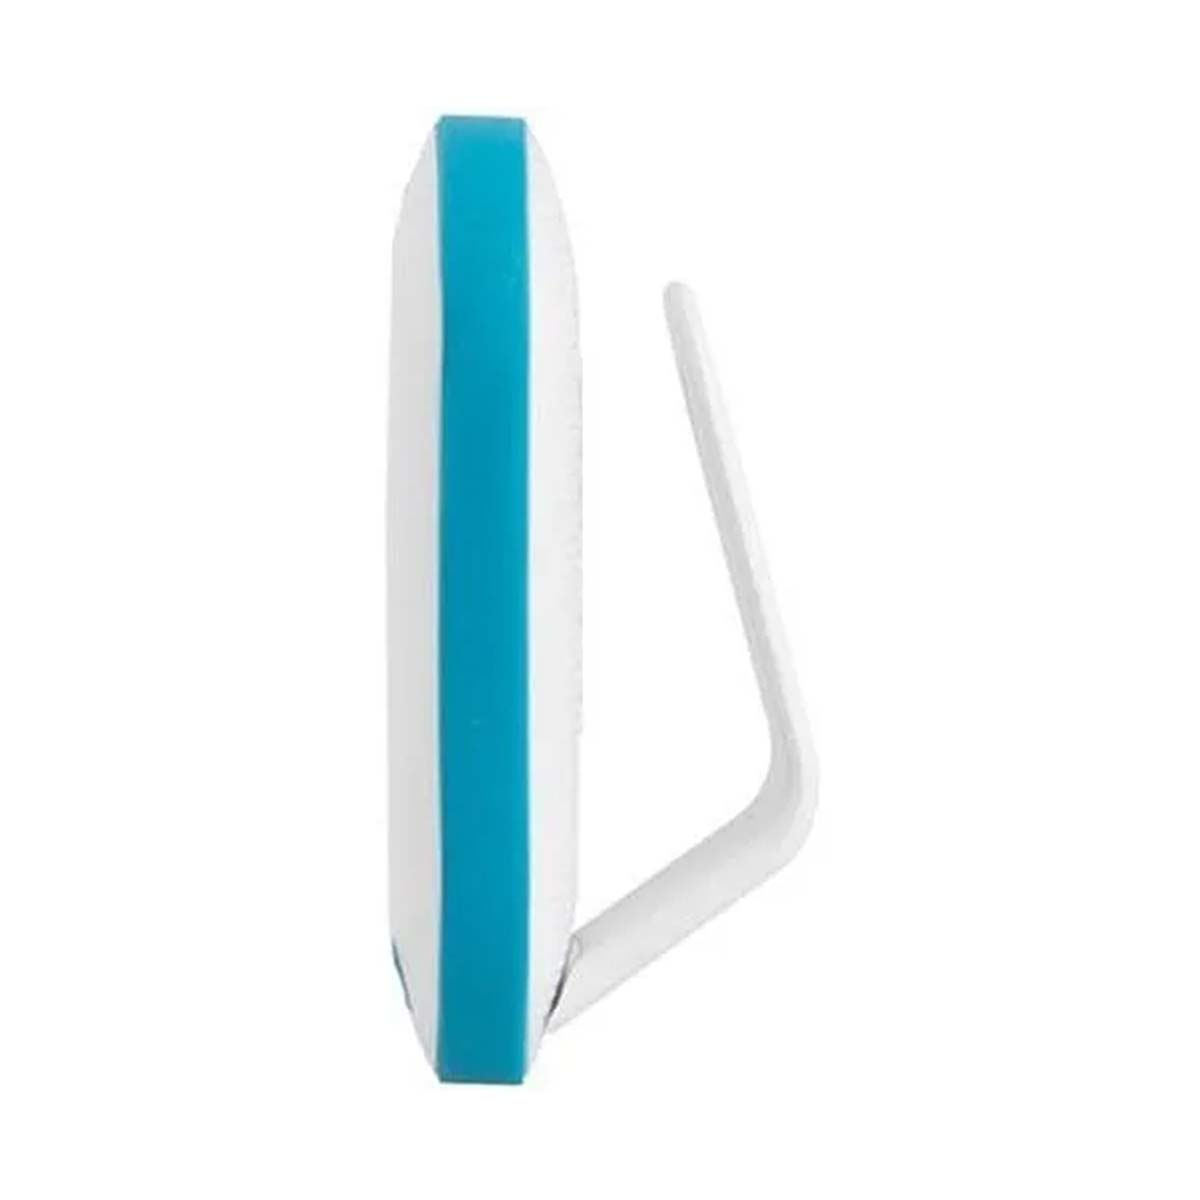 Kit 06 Controle Remoto Intelbras 433mhz Xac 4000 Smart Azul